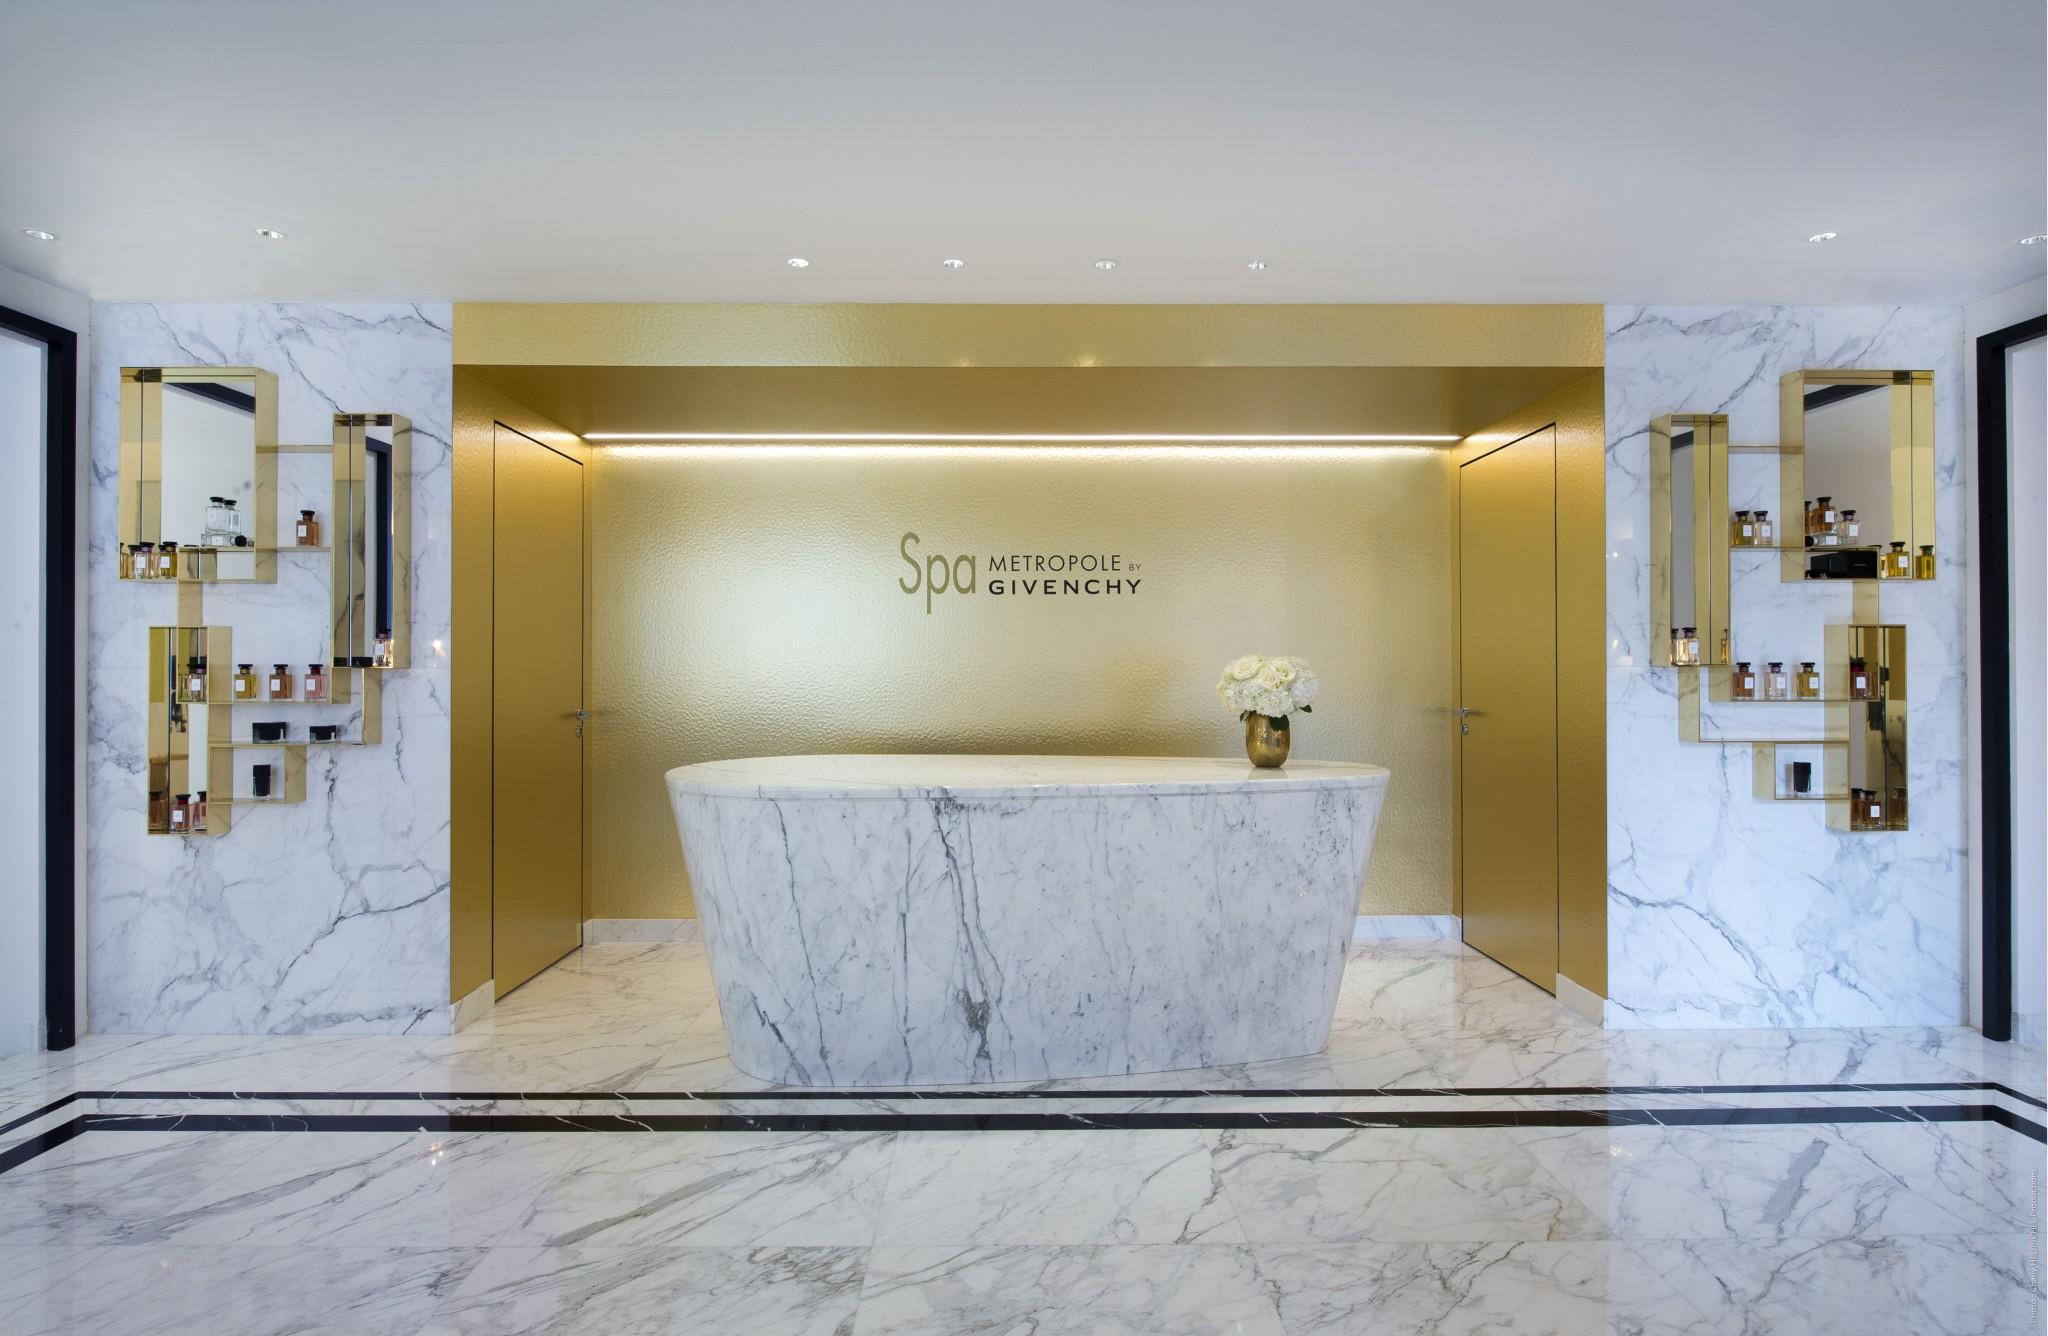 Photo courtesy of Hotel Metropole Monte-Carlo